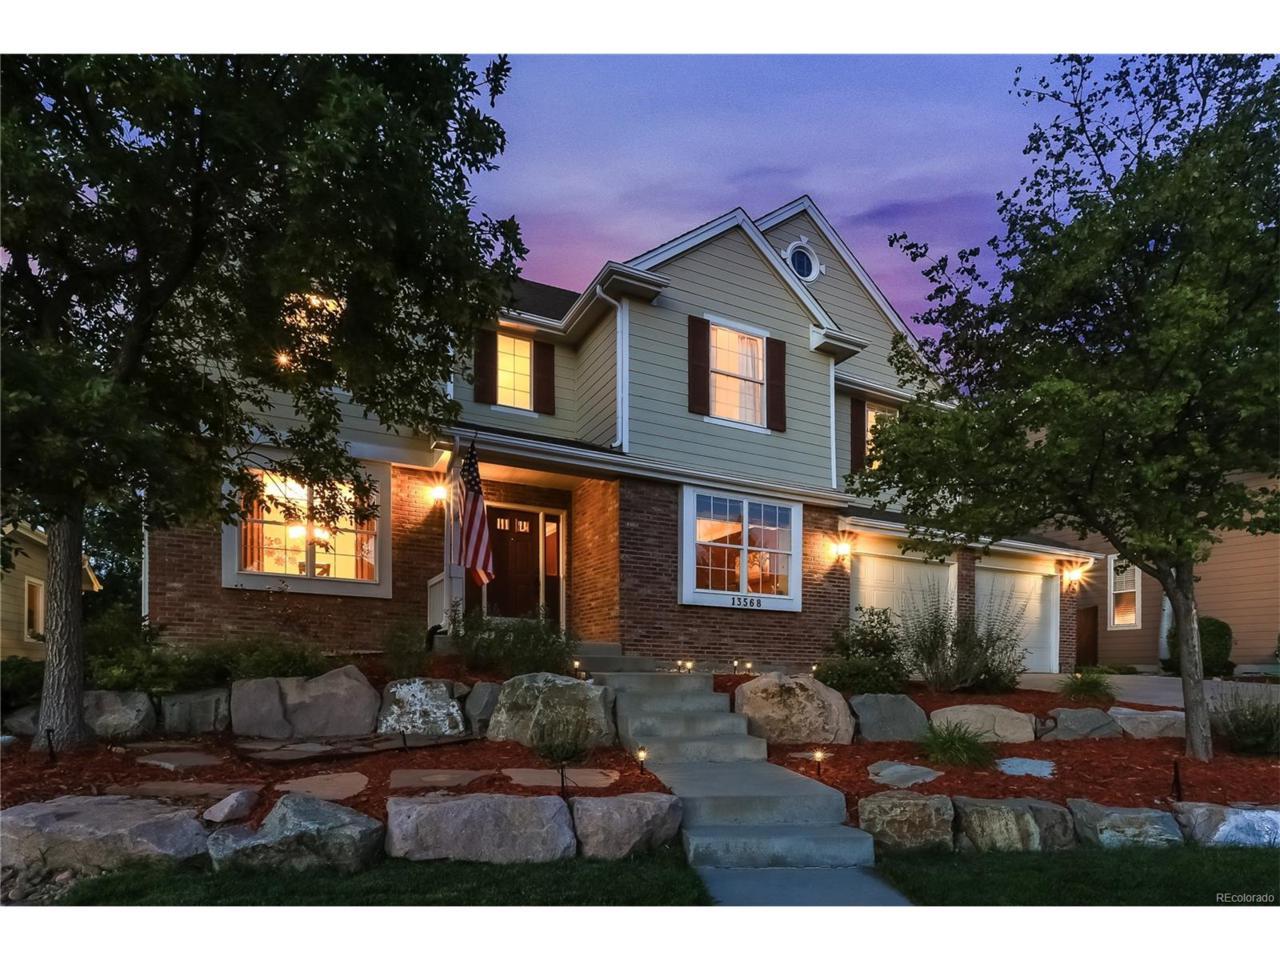 13568 Detroit Street, Thornton, CO 80241 (MLS #7158190) :: 8z Real Estate